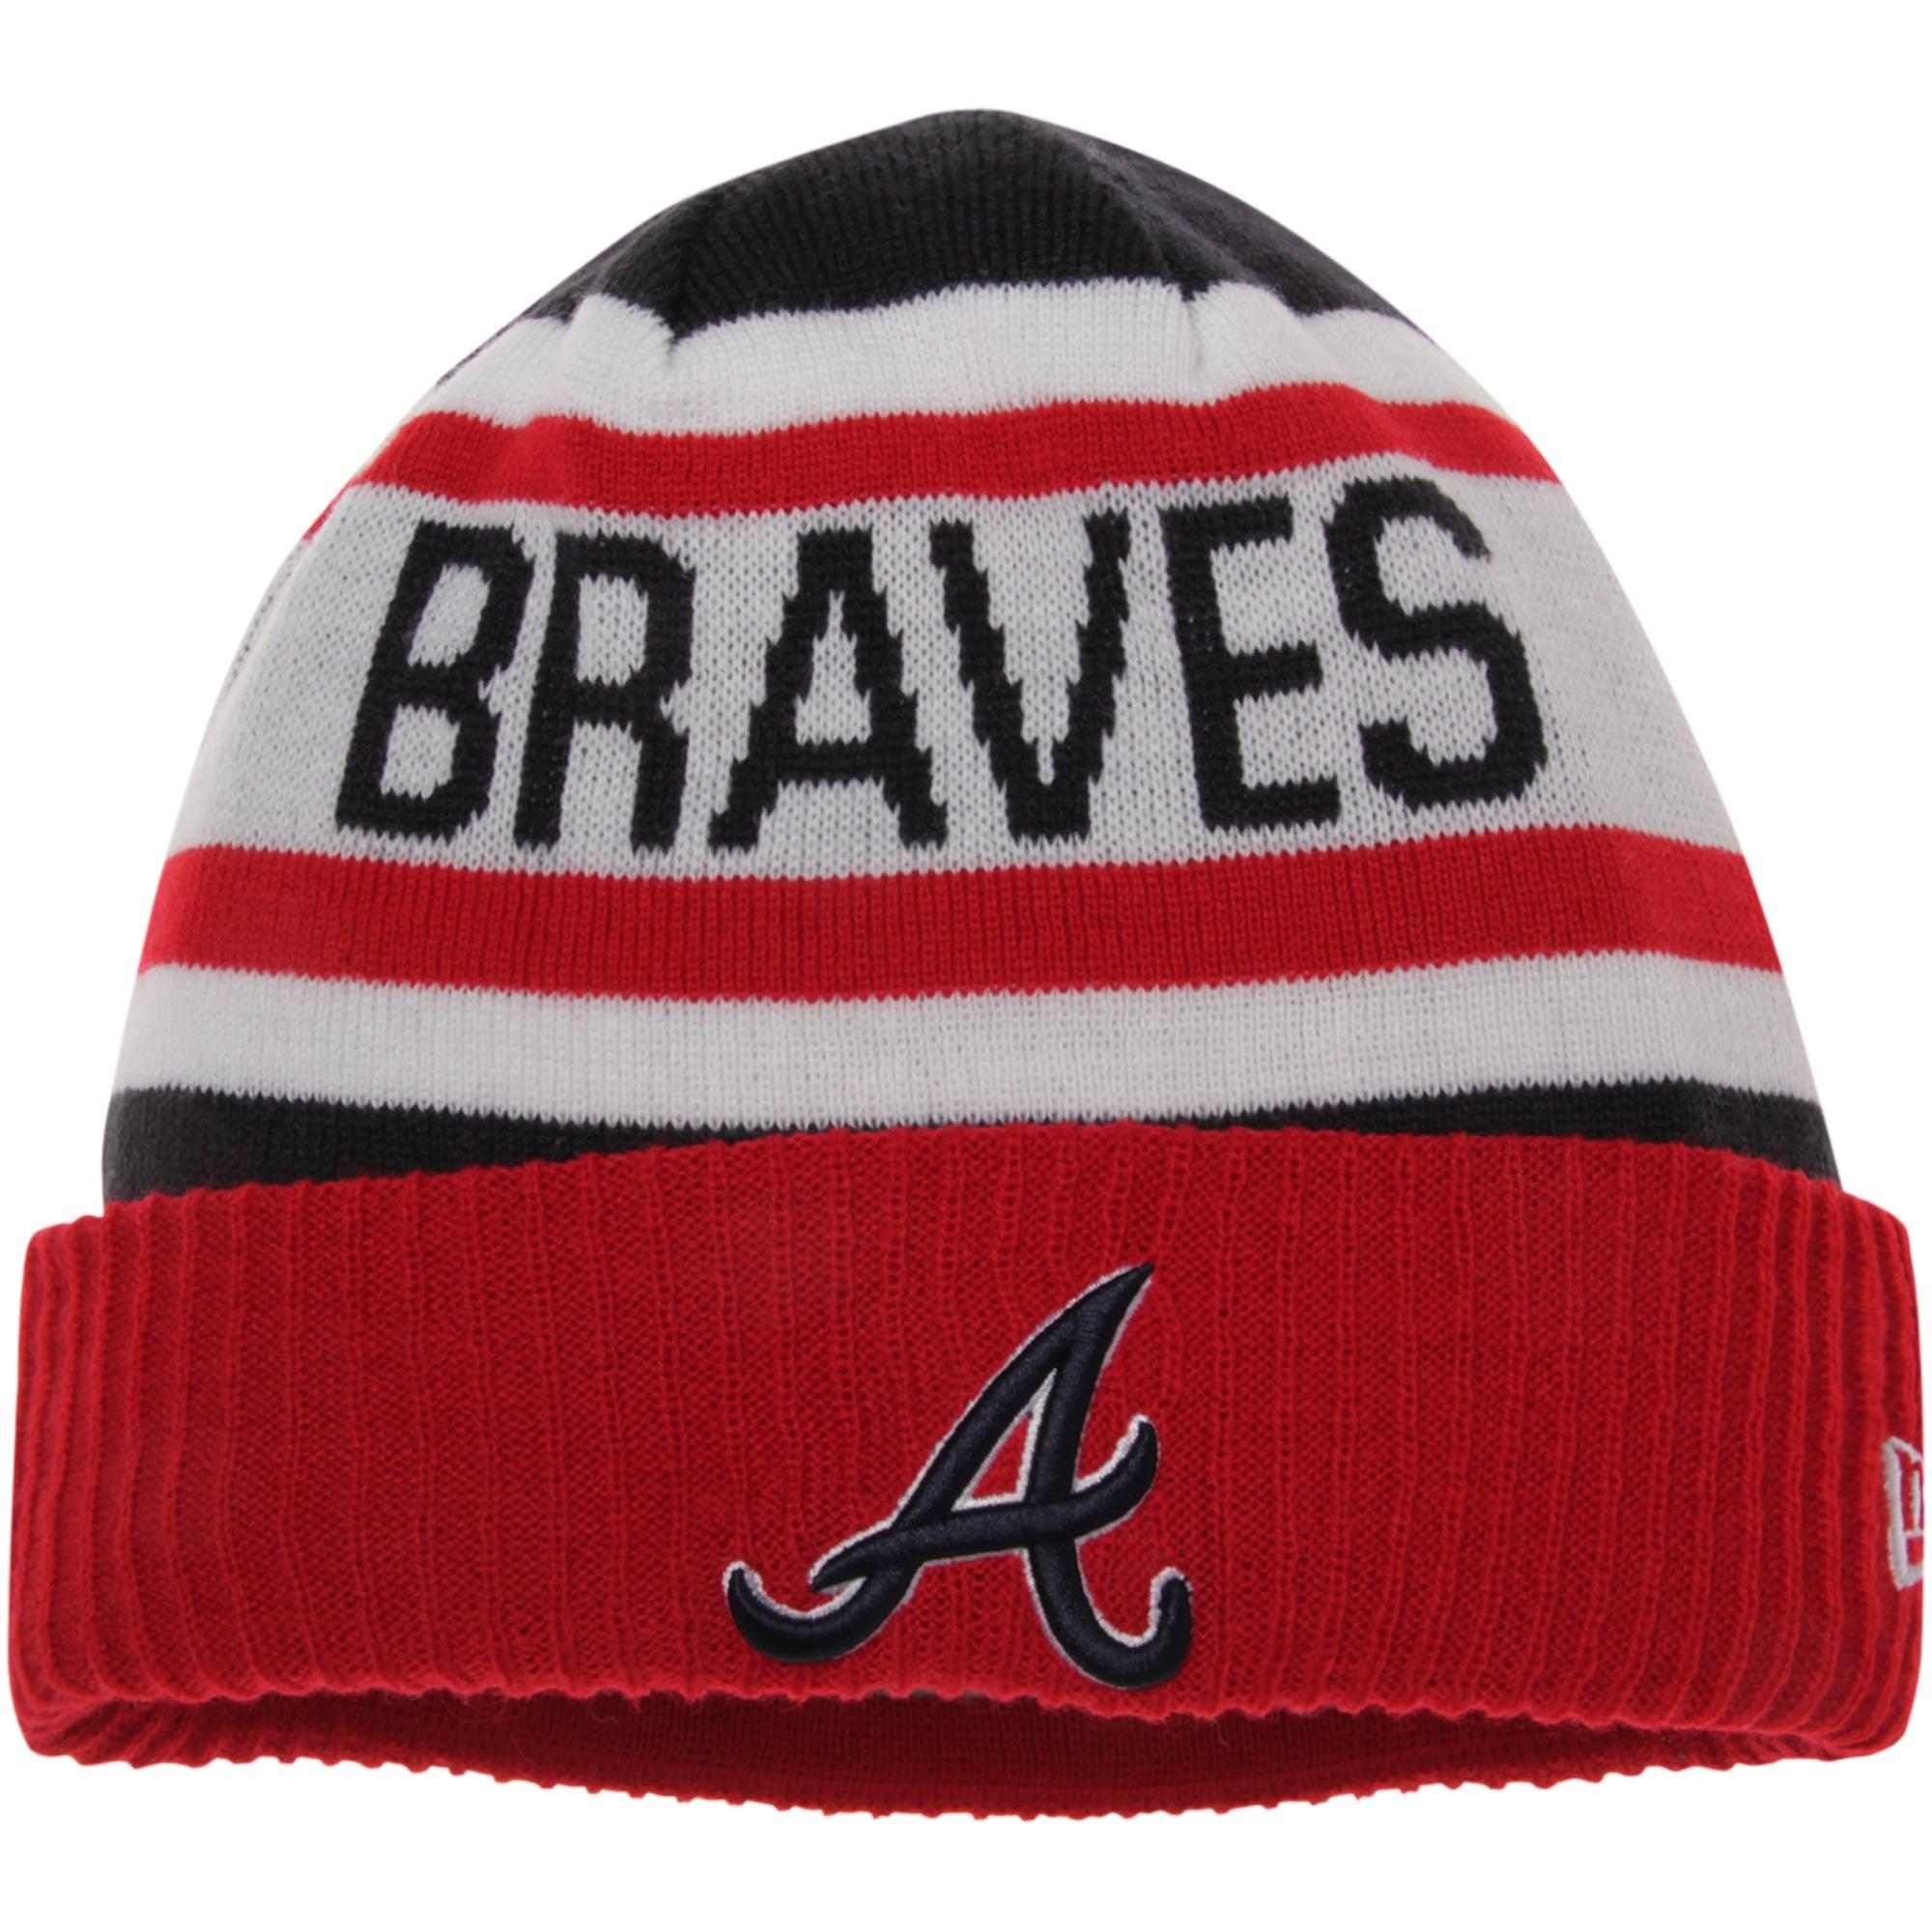 Atlanta Braves New Era Biggest Fan 2.0 Cuffed Knit Hat - White/Red - OSFA